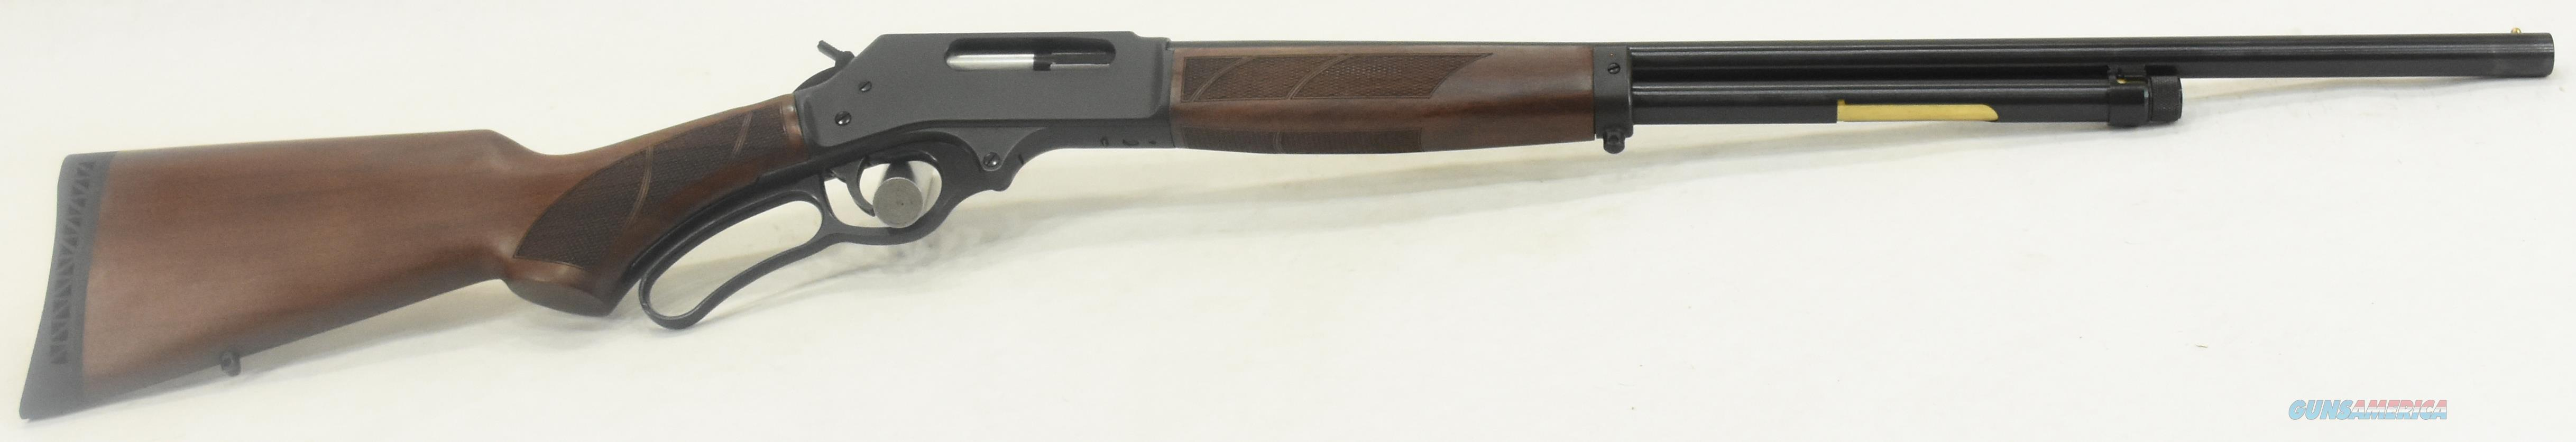 Lever Action 410Ga Choke Tubes 24In  H018-410  Guns > Rifles > Henry Rifles - Replica